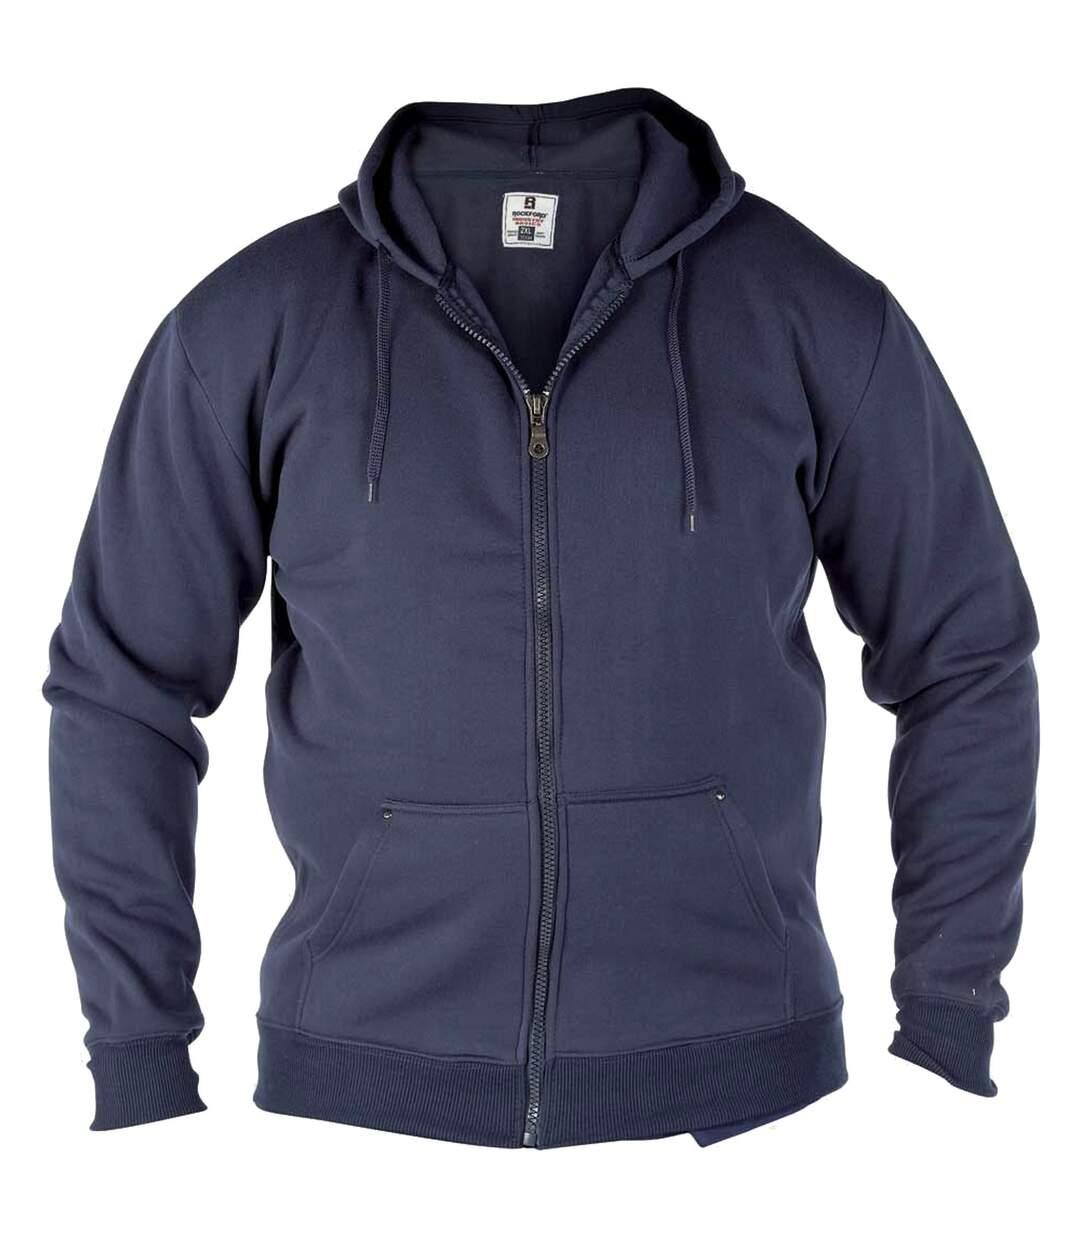 Duke Rockford - Sweat À Capuche Zippé Grande Taille - Homme (Bleu marine) - UTDC104